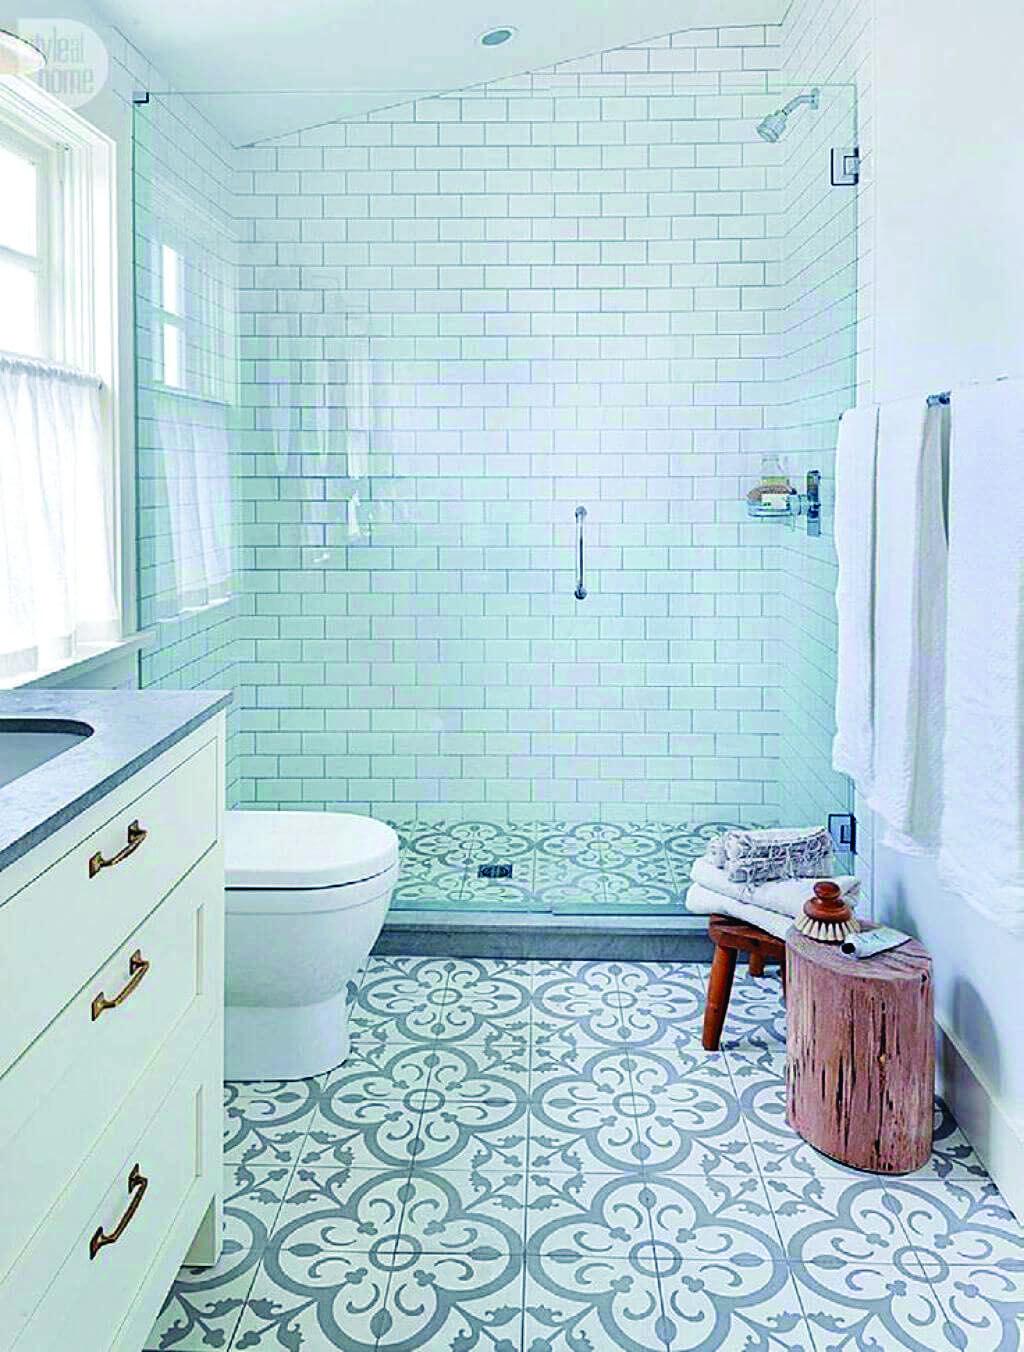 Restroom Ceramic Tile Design Suggestions Small Bathroom Bathrooms Remodel Bathroom Floor Tiles